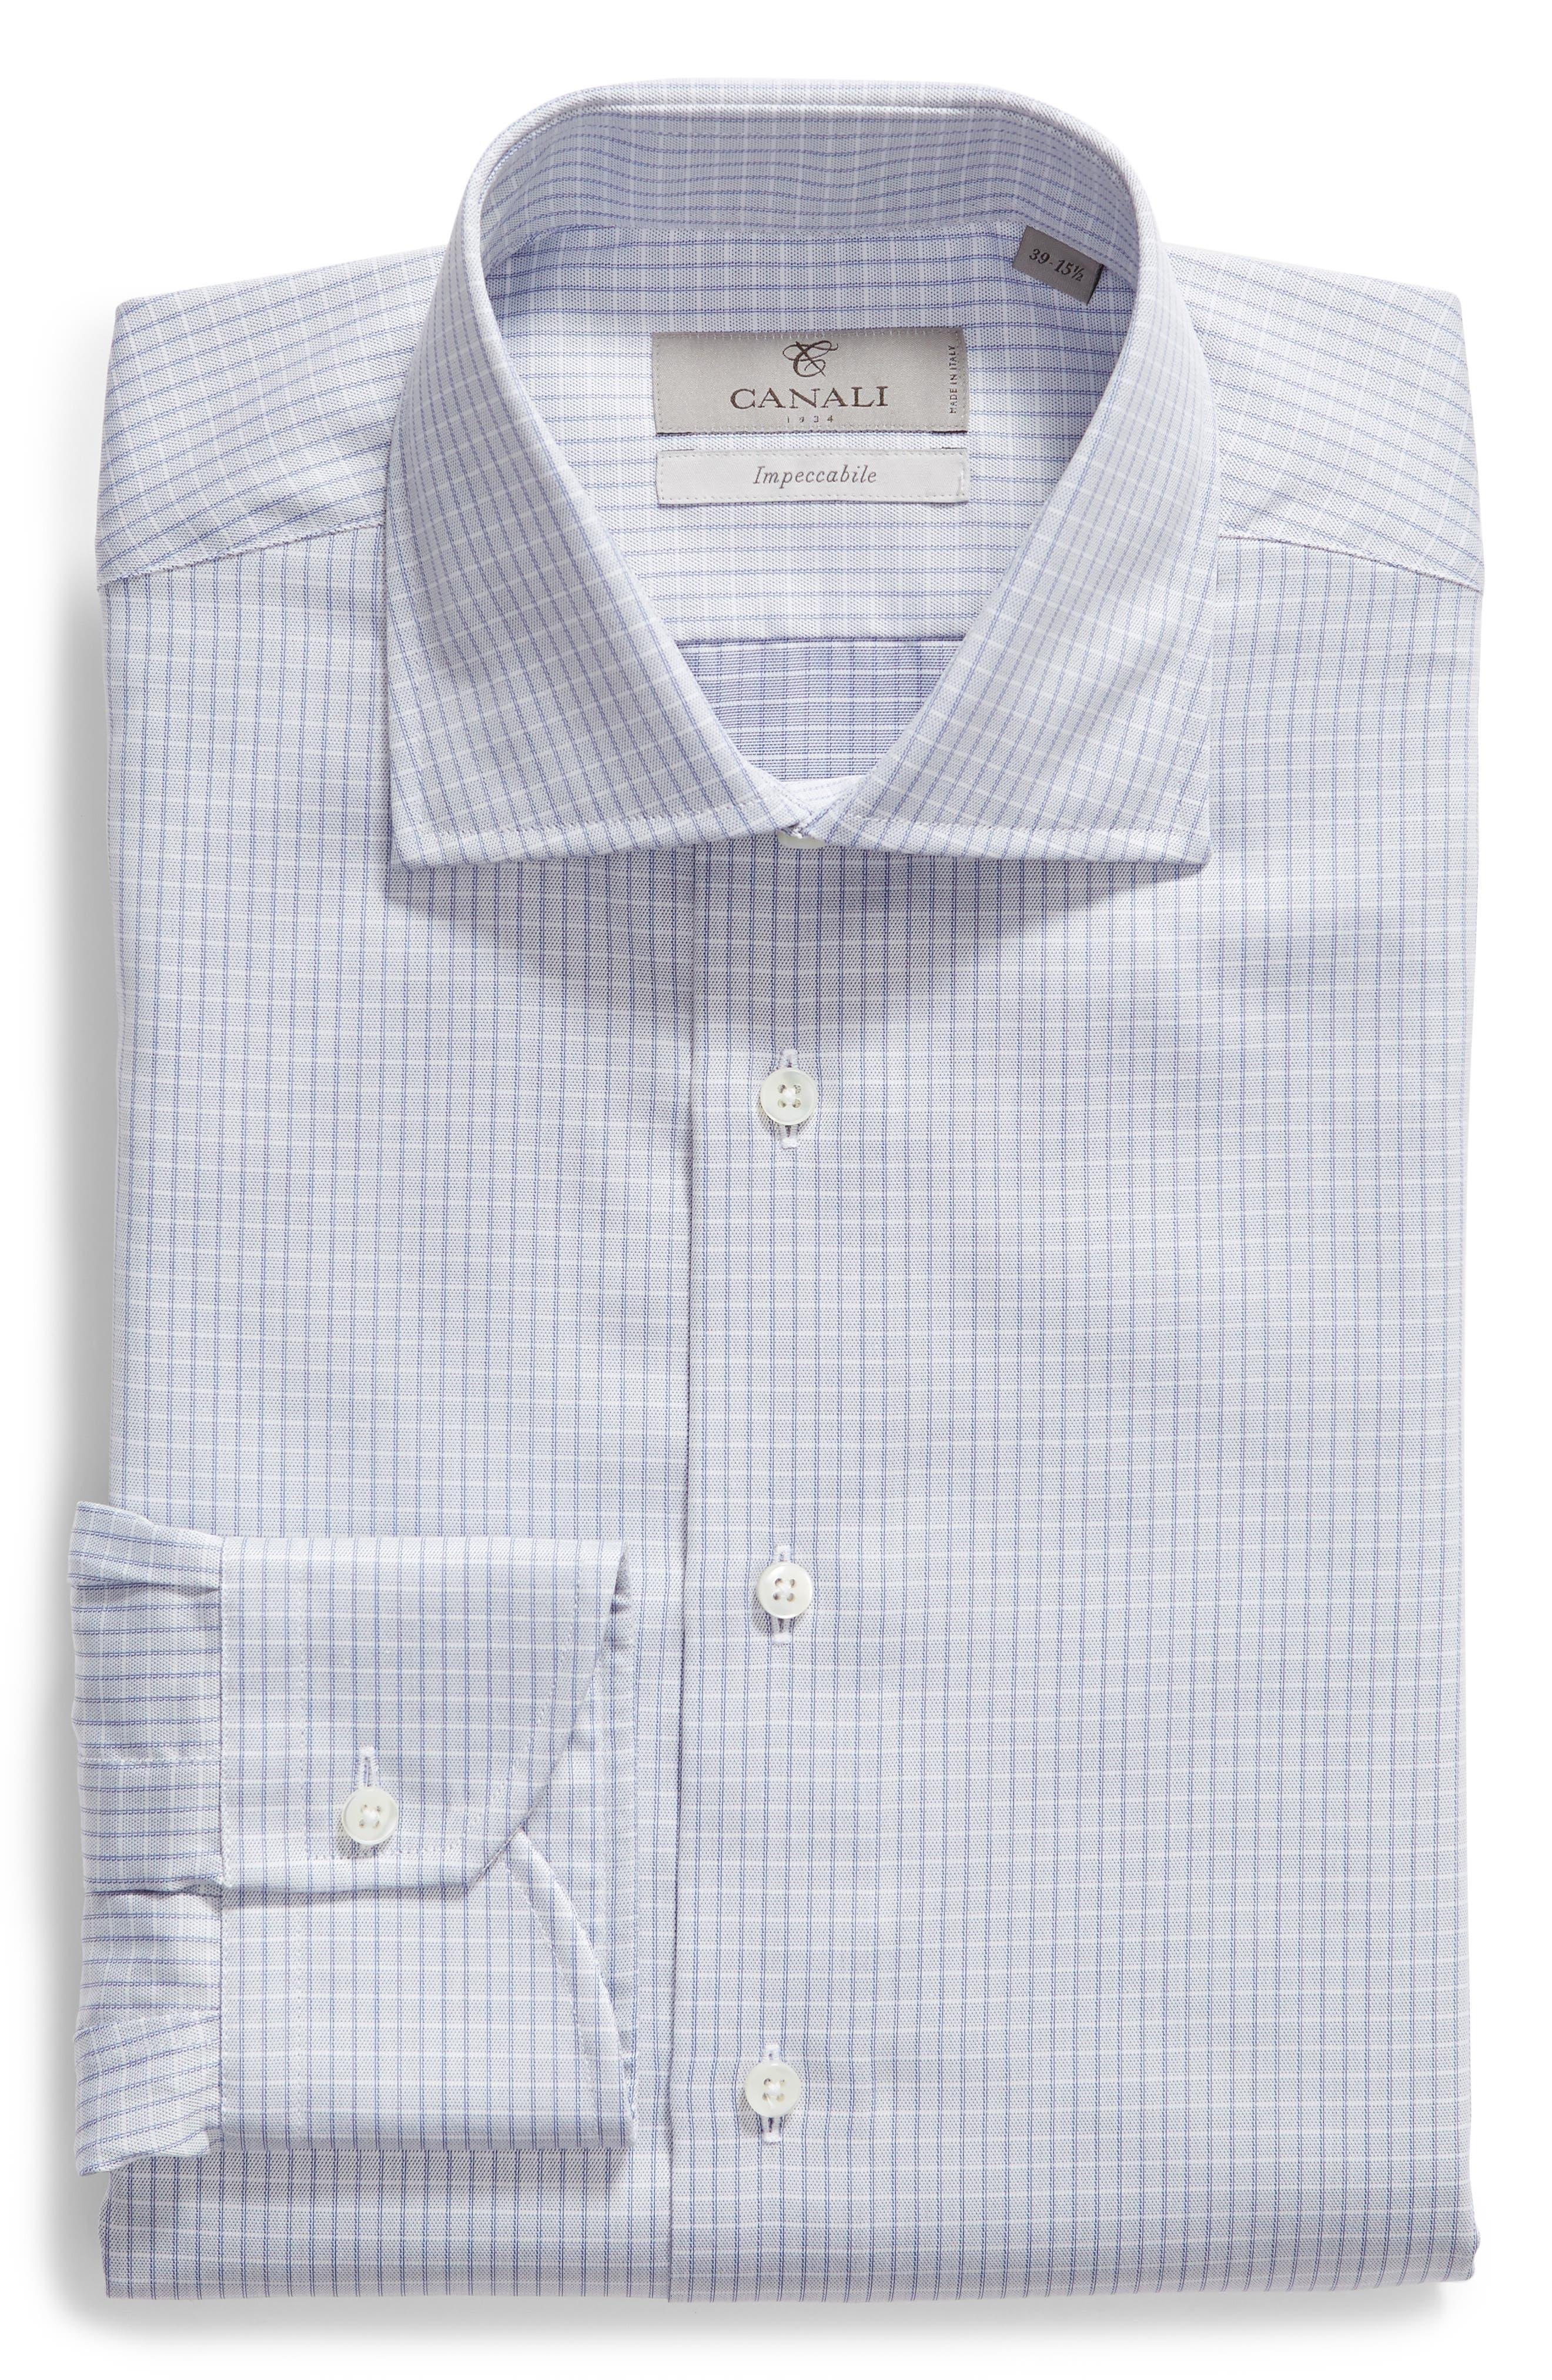 CANALI, Regular Fit Check Dress Shirt, Main thumbnail 1, color, LIGHT BLUE